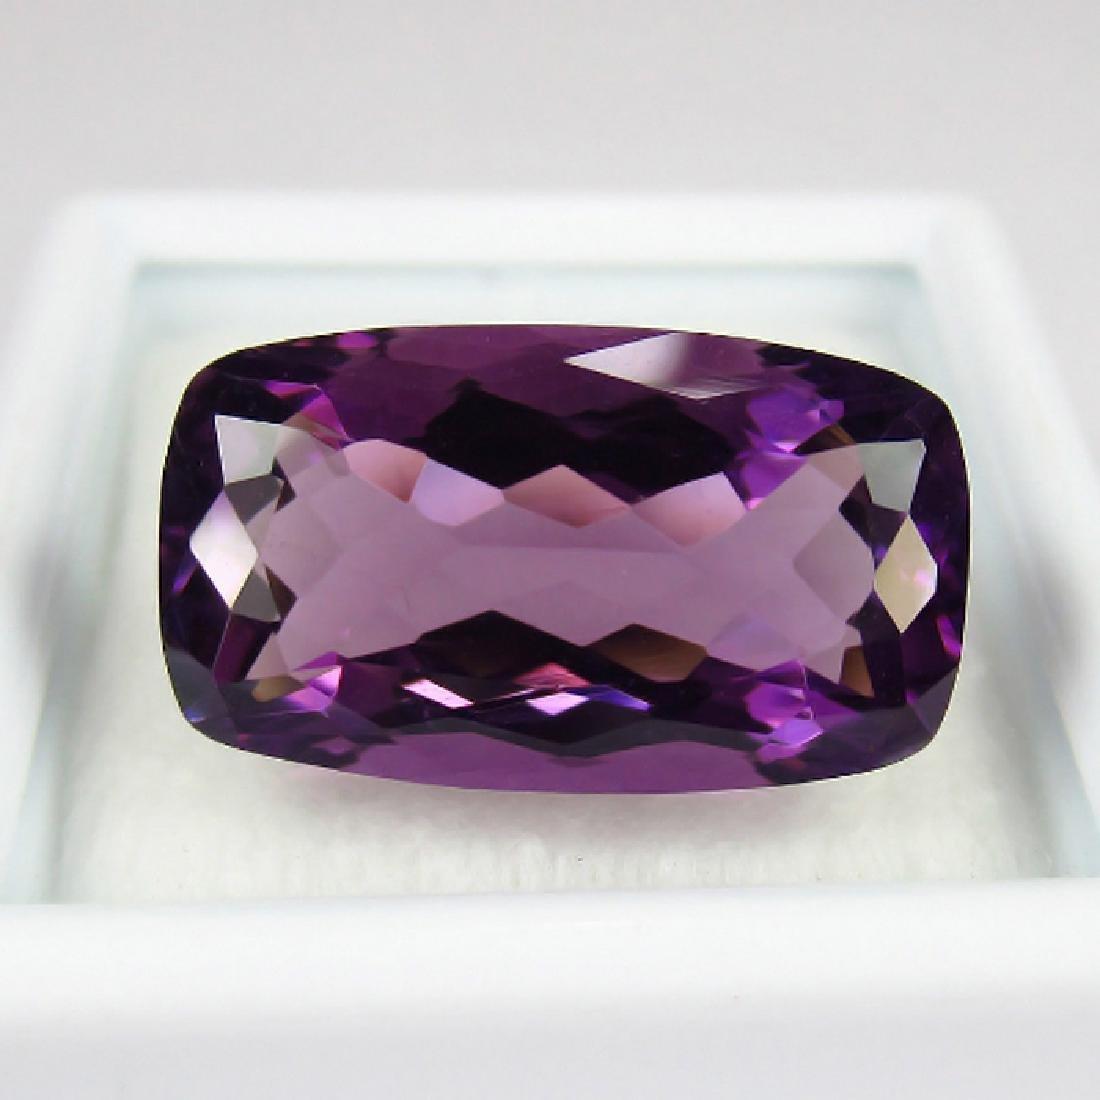 9.32 Ct Genuine Loose Amethyst Full Luster Purple